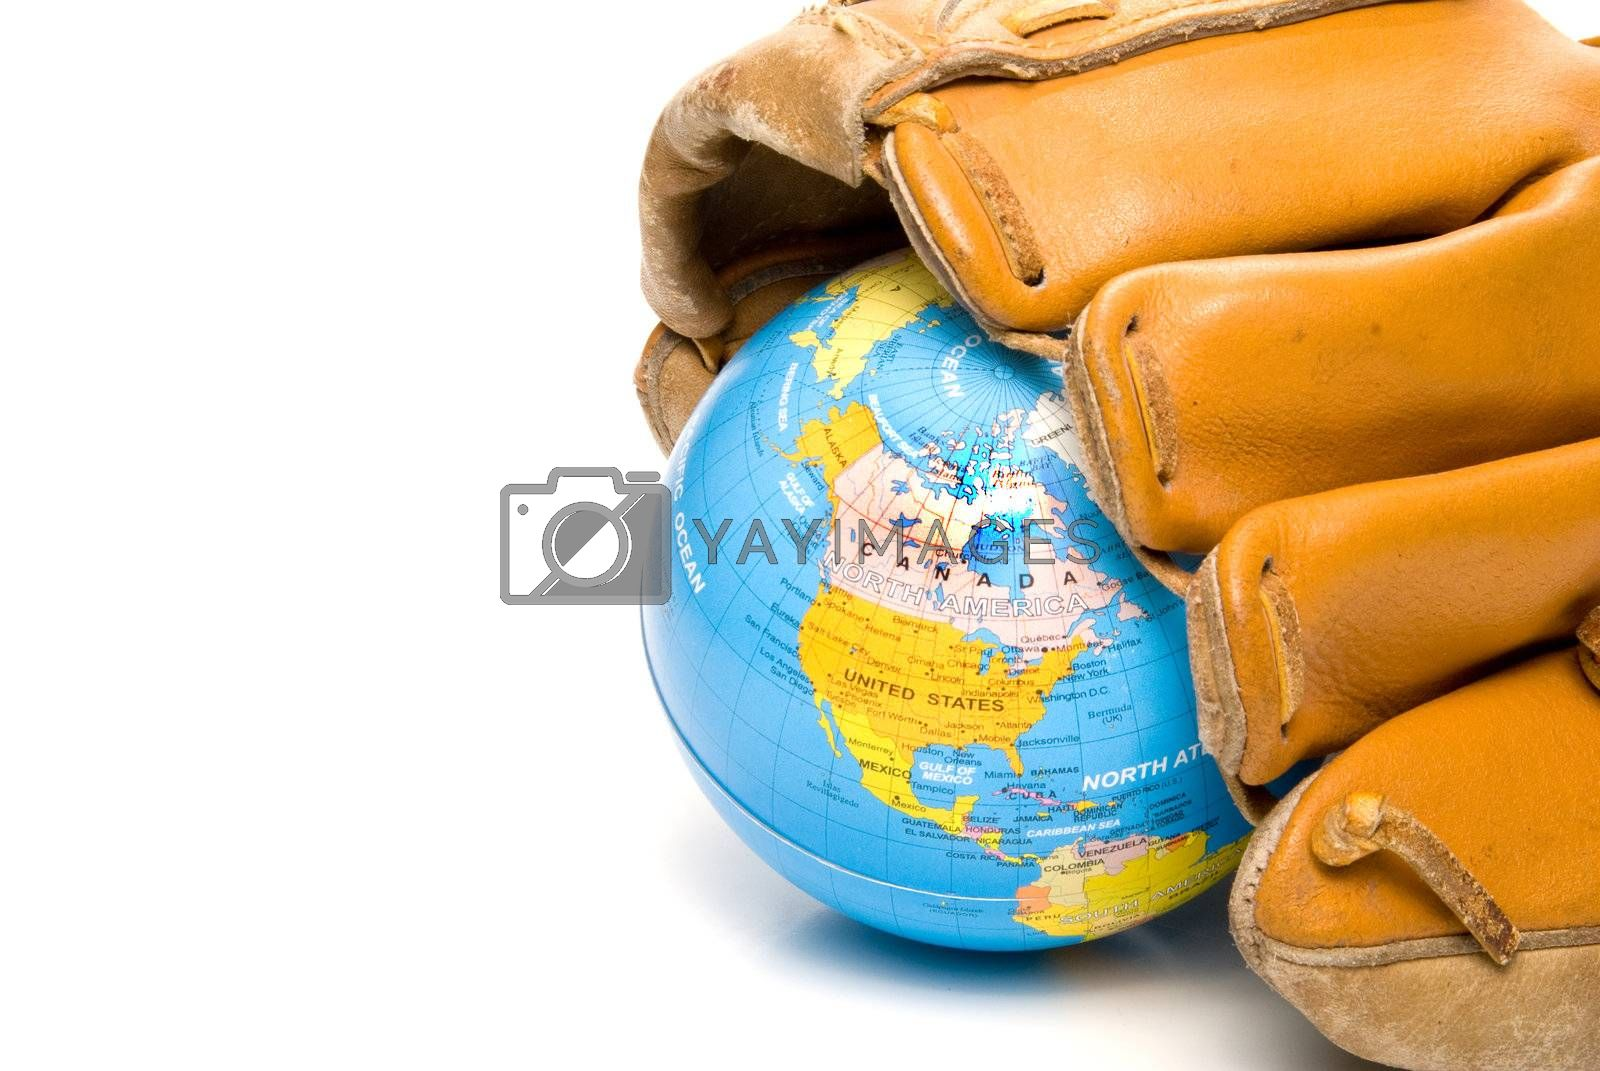 The ever so wonderful world of International baseball.